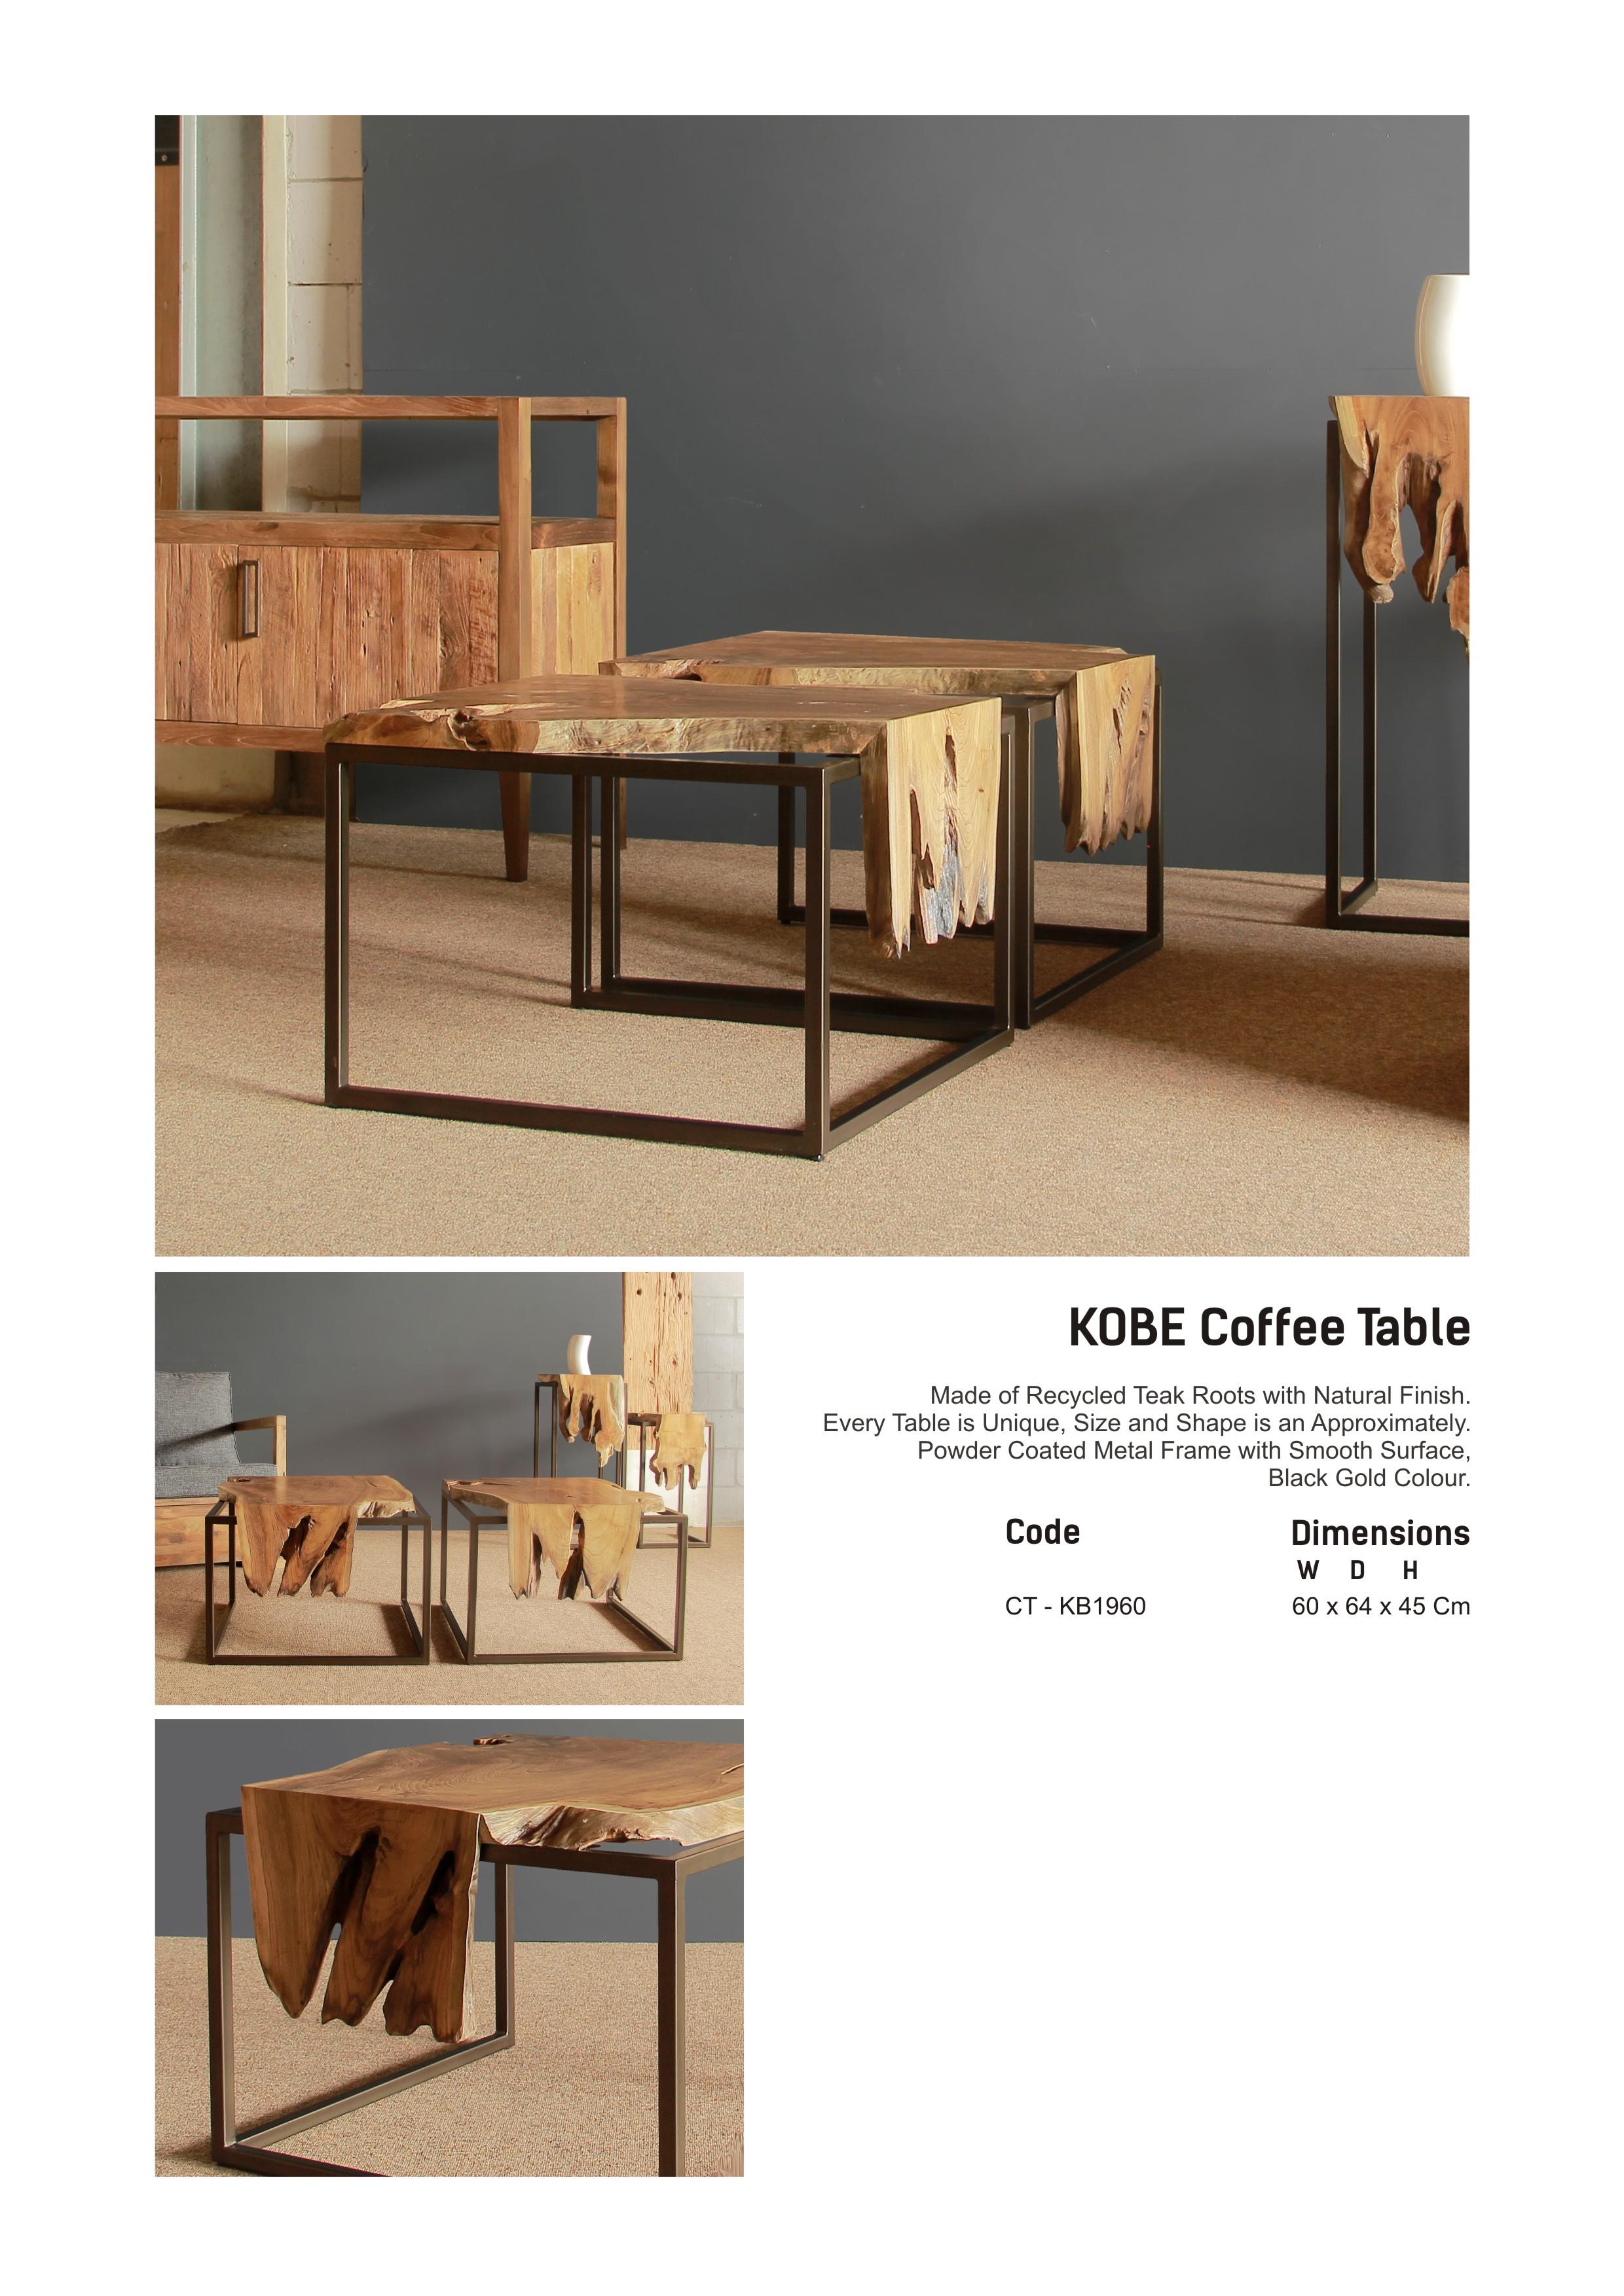 19. KOBE Coffee Table